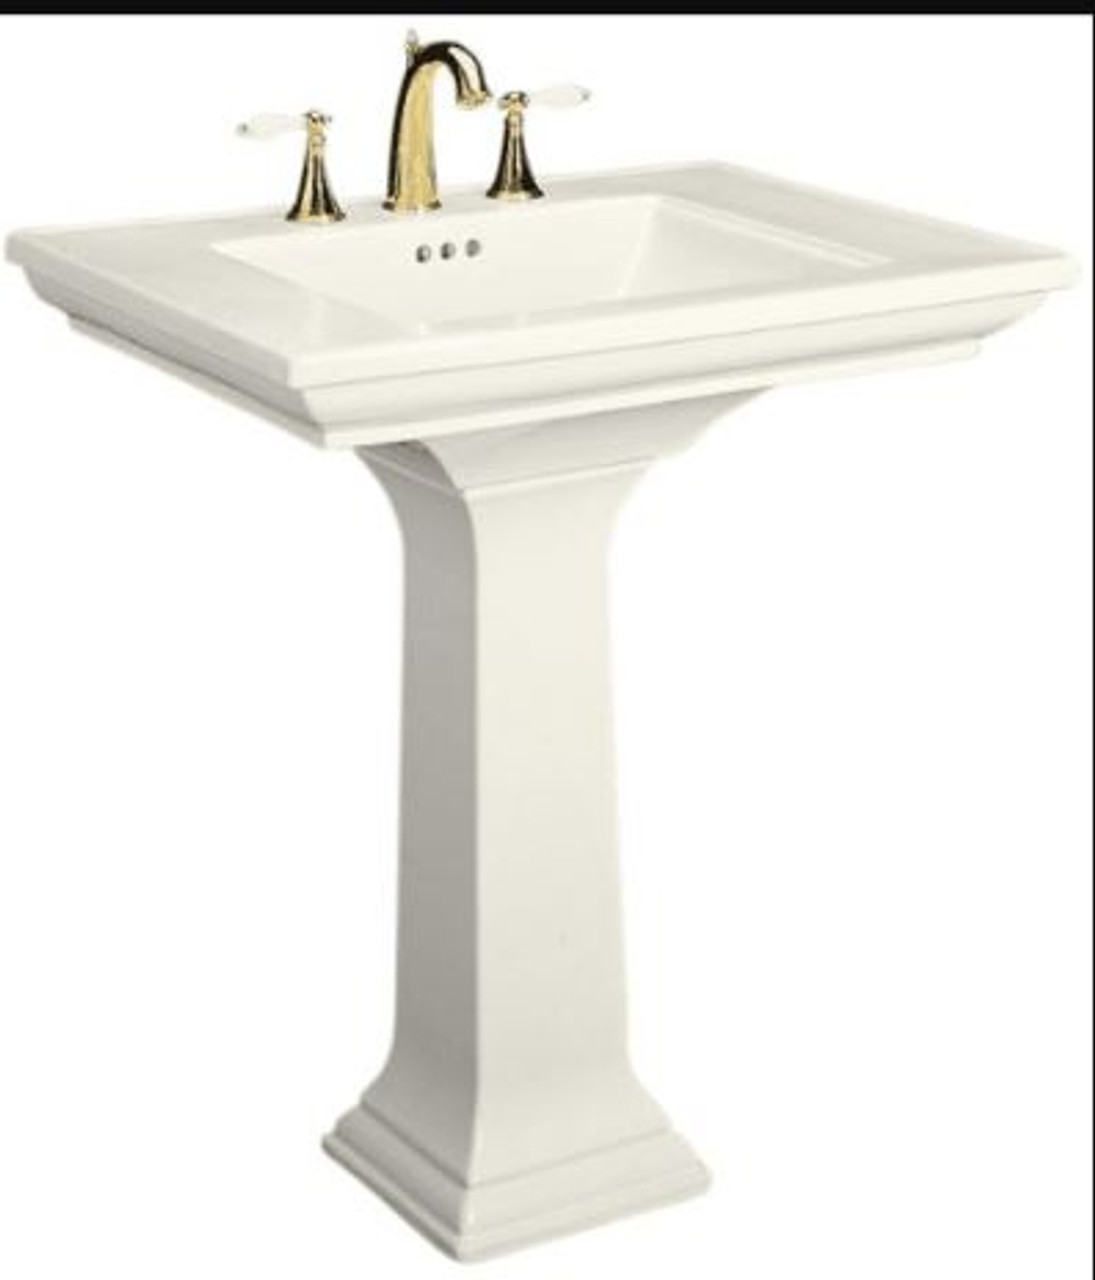 kohler memoirs pedestal lavatory with single hole faucet drilling